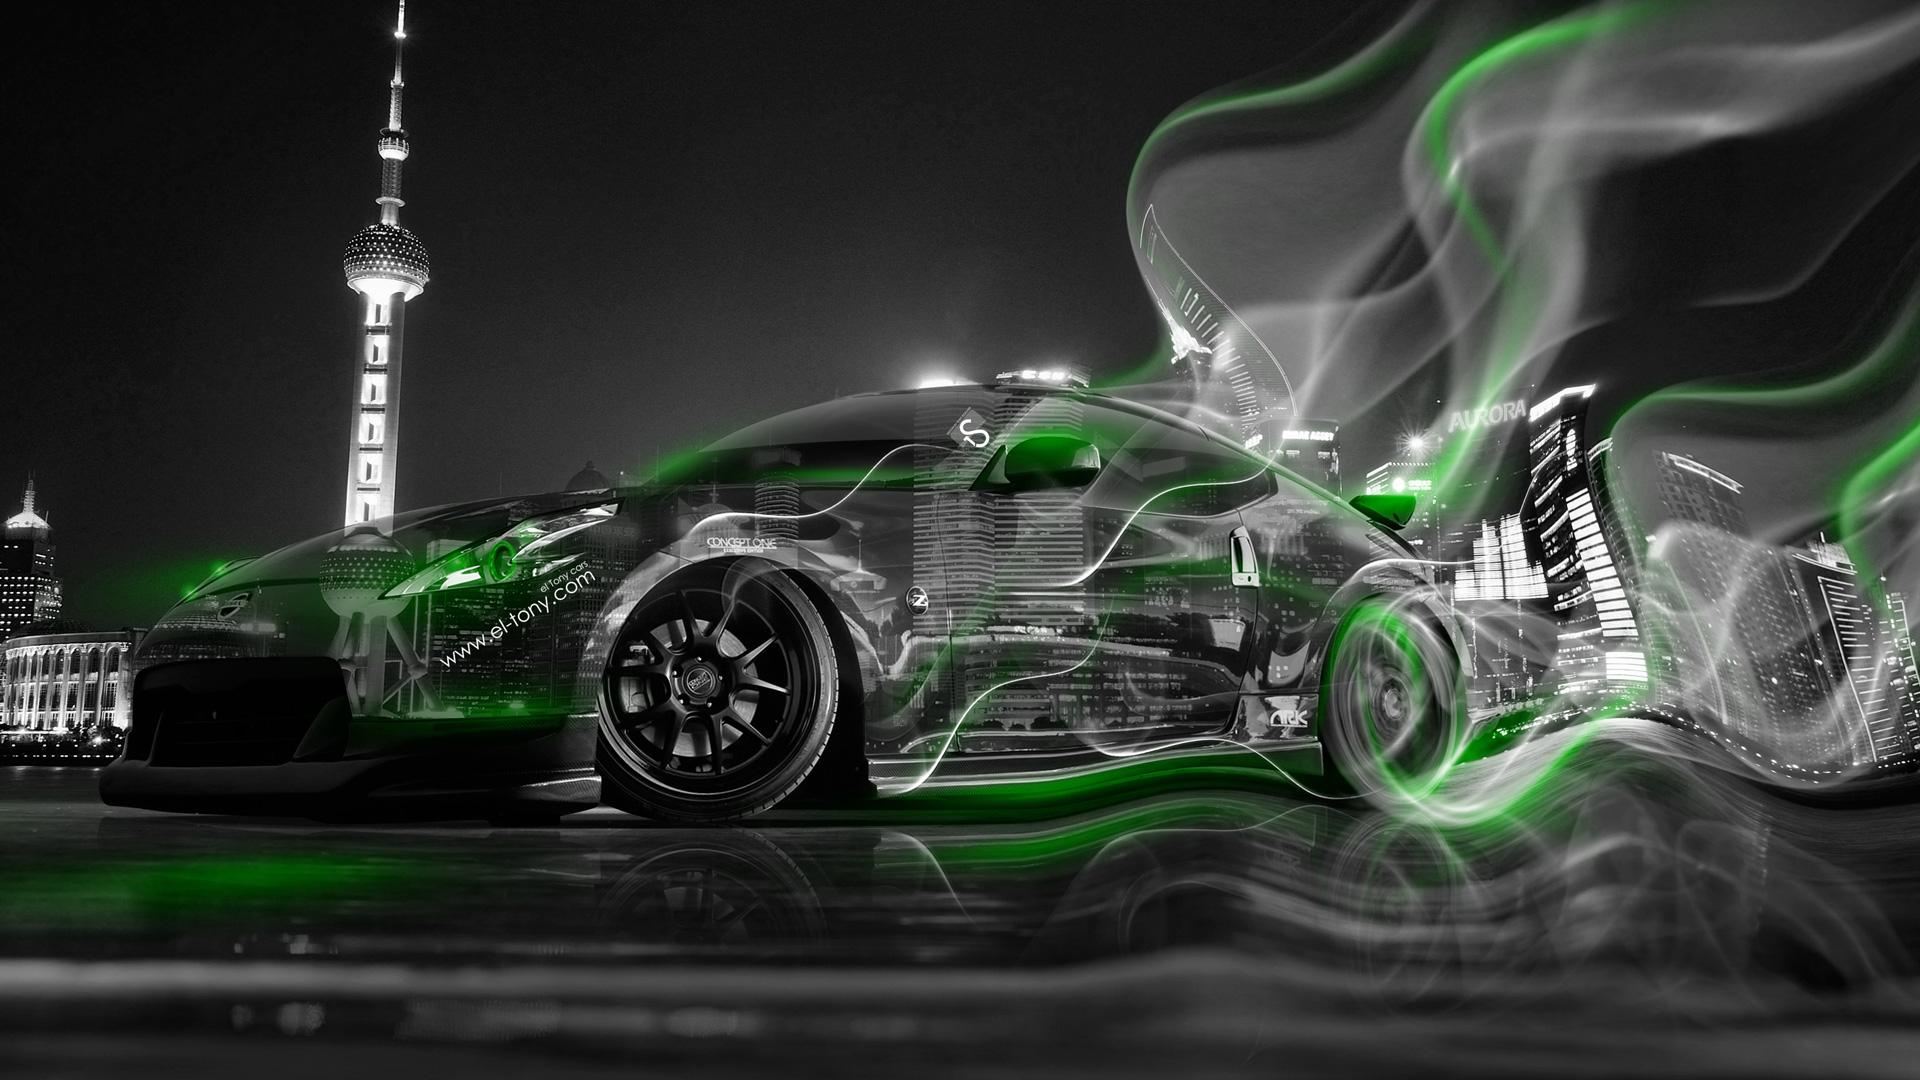 JDM Crystal City Smoke Drift Car 2014 Art